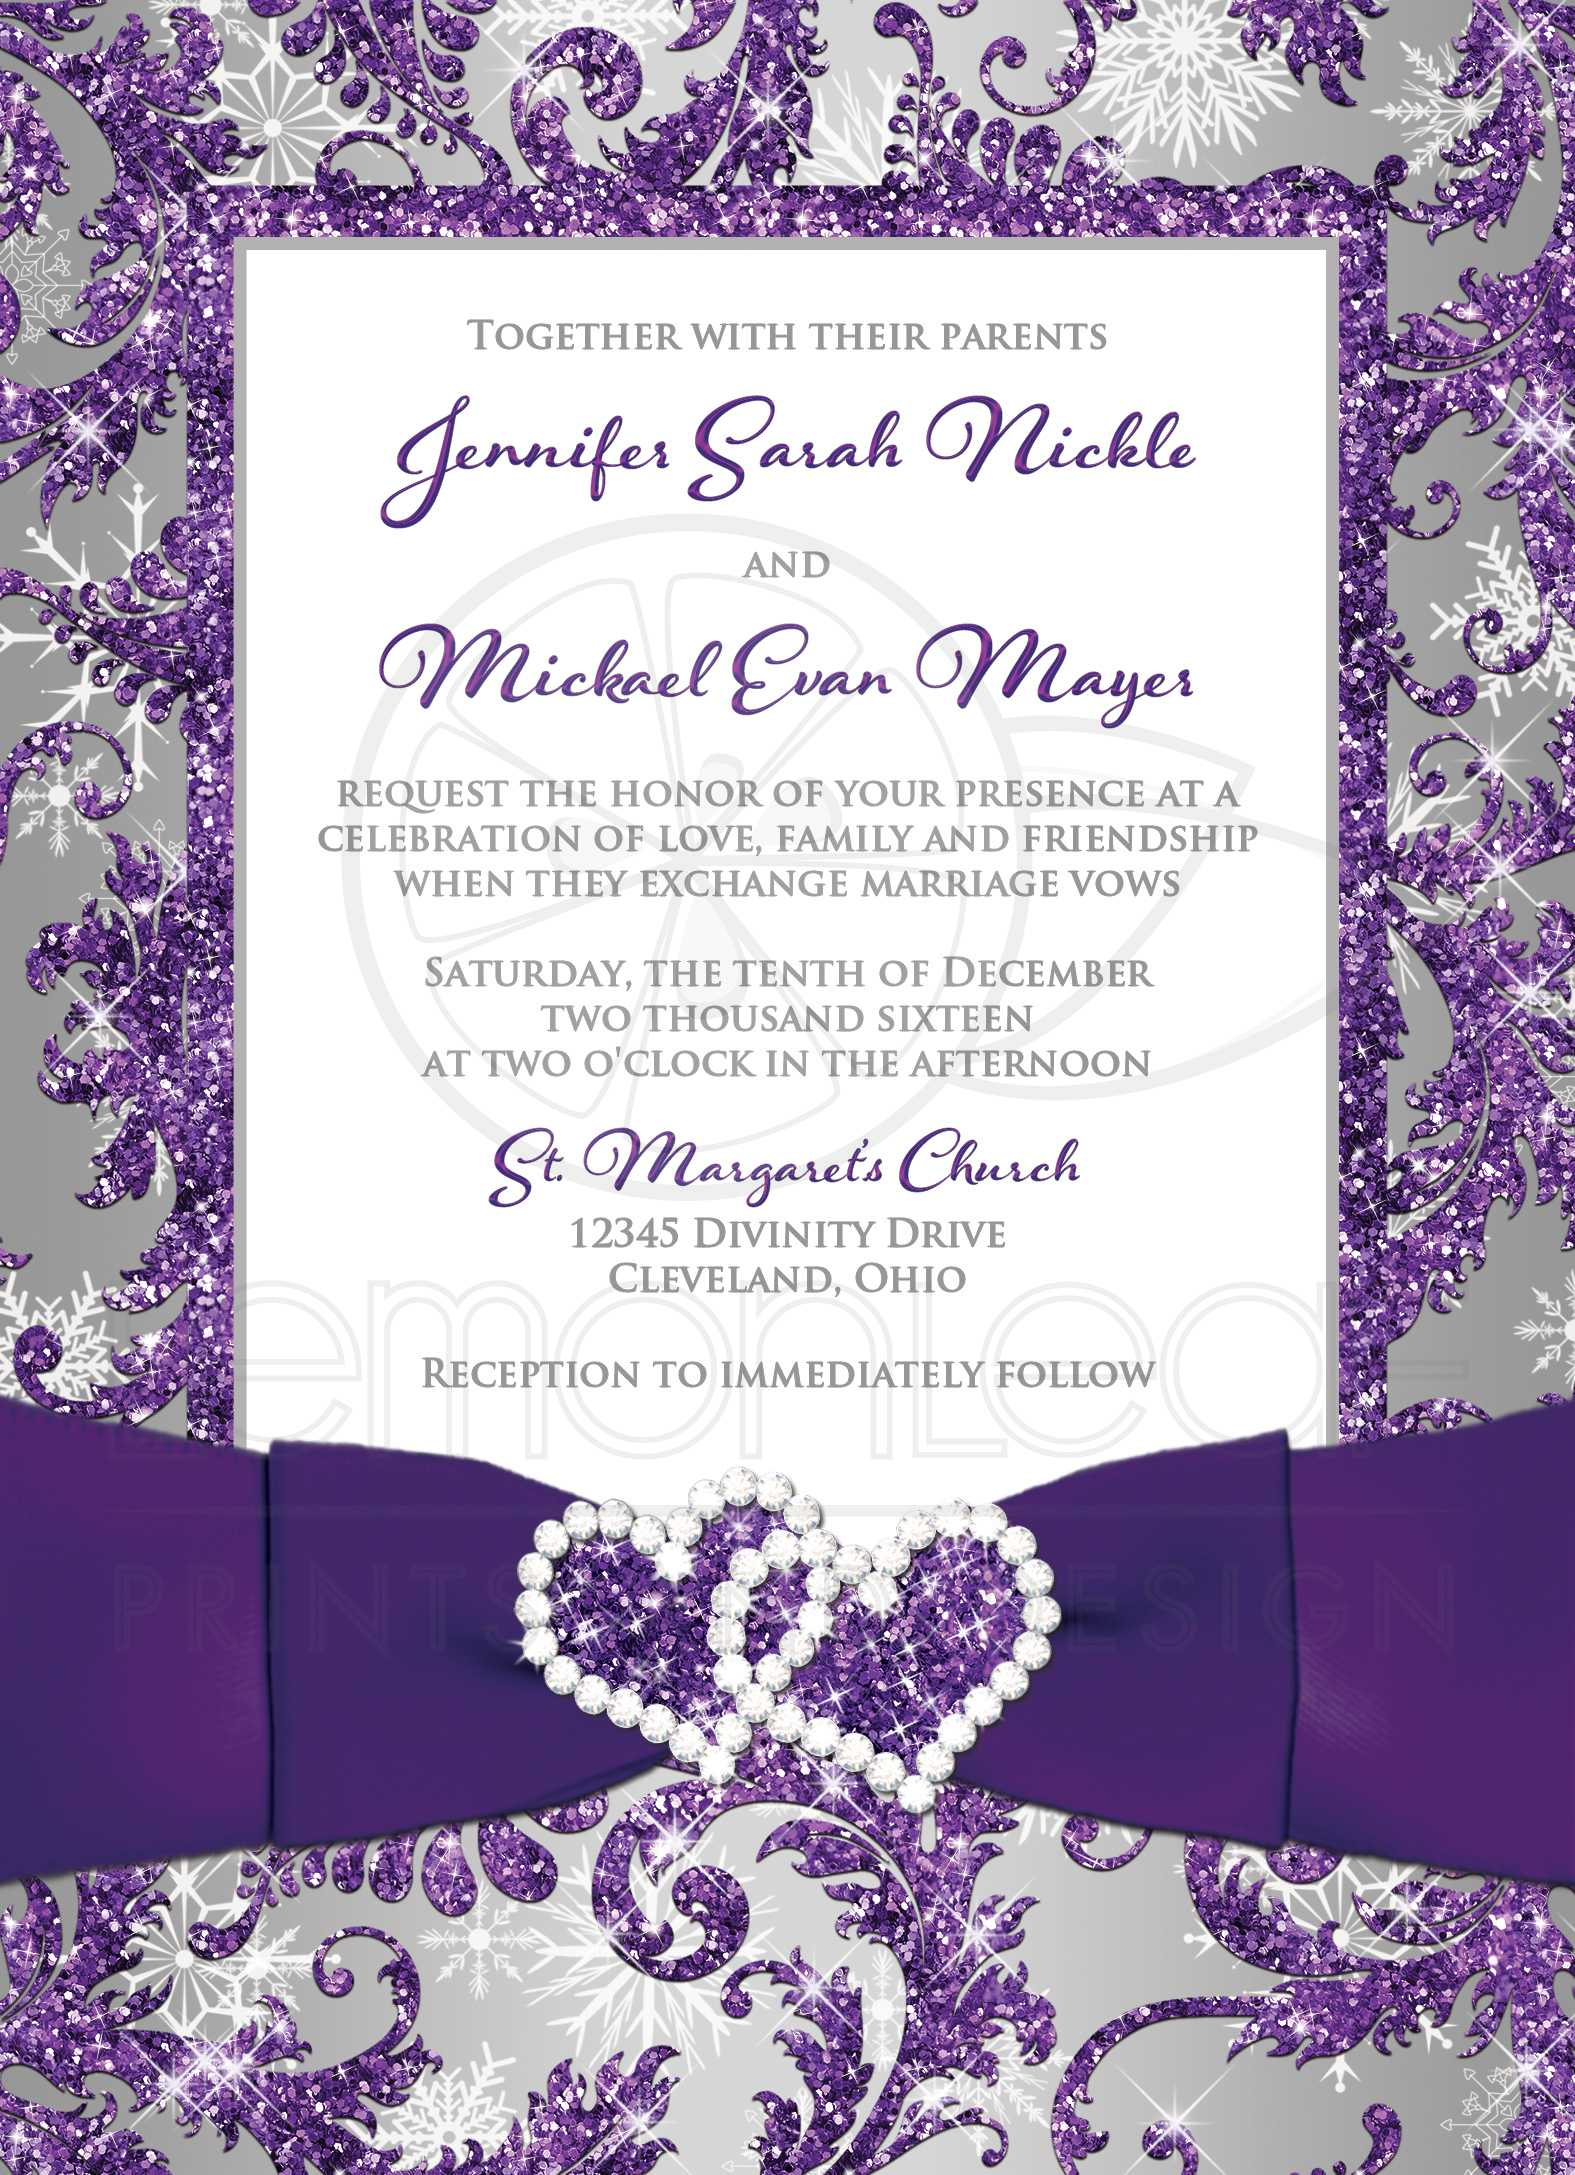 Winter Wonderland PHOTO Wedding Invitation | Purple, Silver, White ...